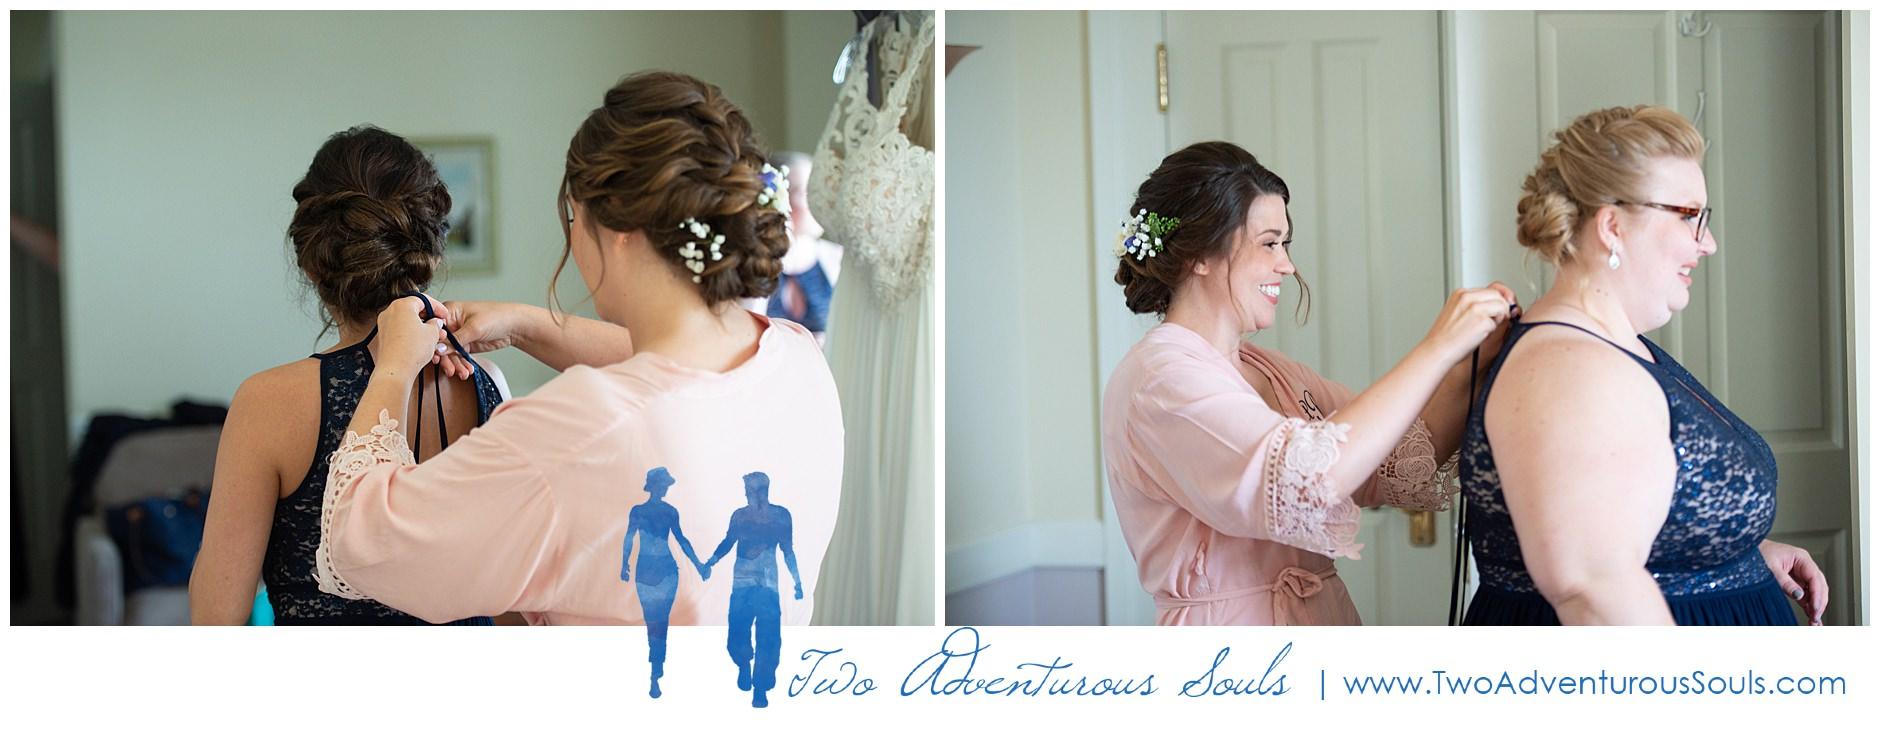 Maine Wedding Photographers, SMCC Wedding Photographers, Southern Maine Community College Wedding Photographers, Two Adventurous Souls-AshleyAaron_0008.jpg